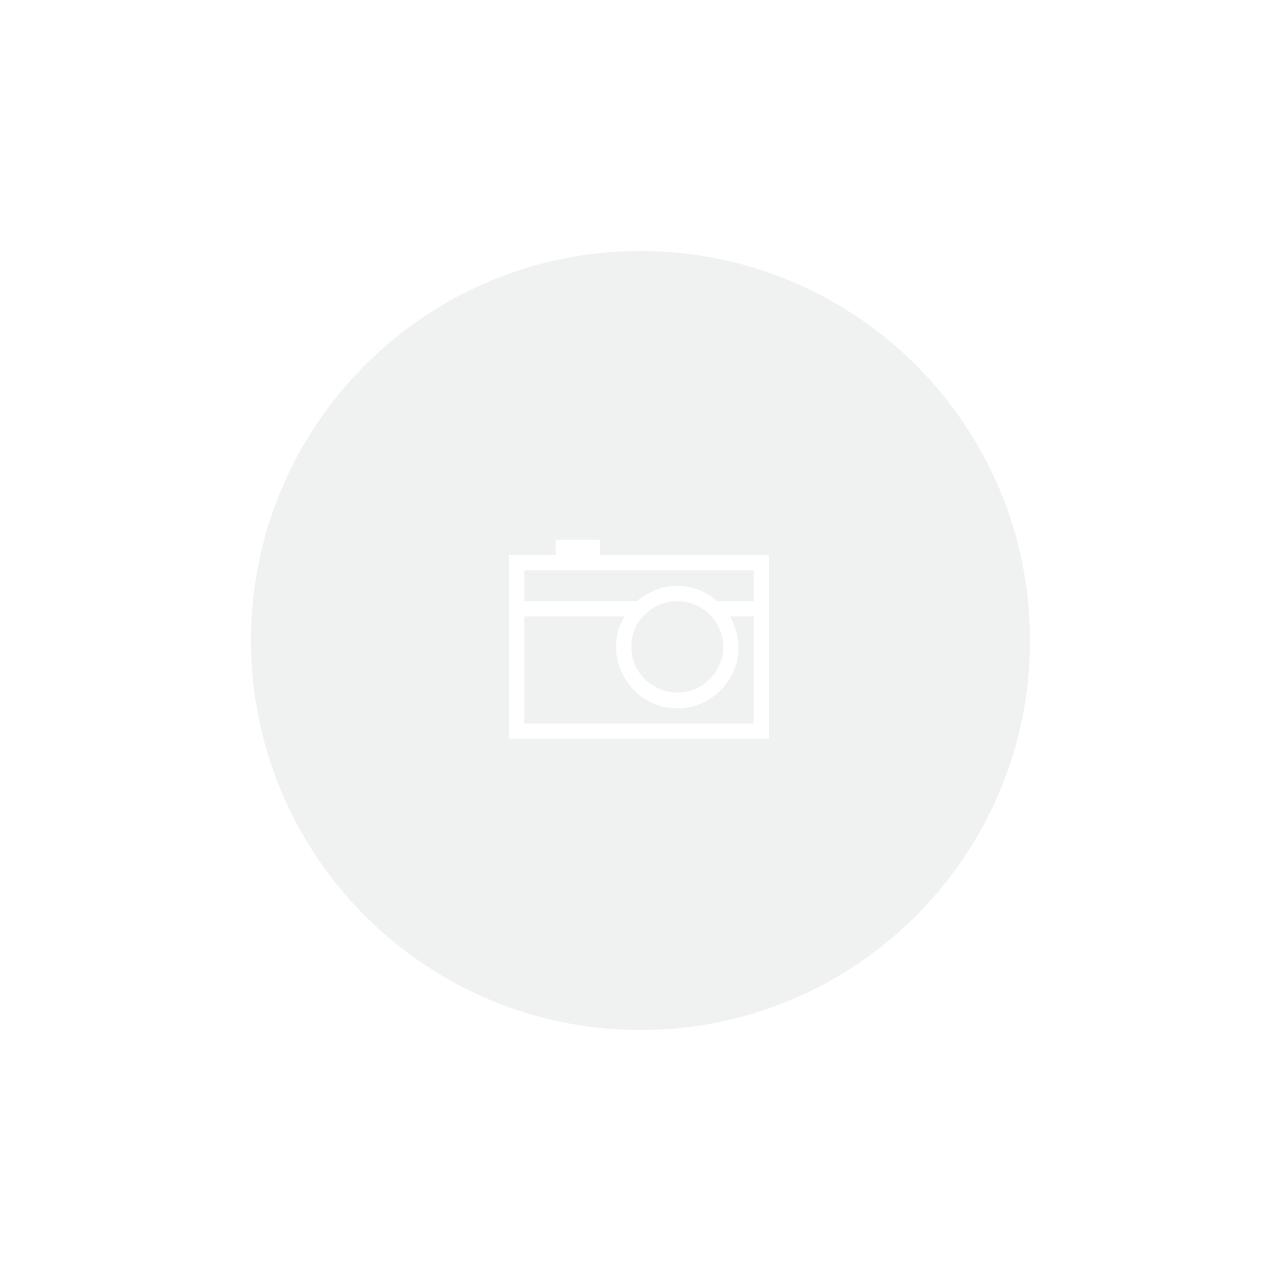 Filtro de ar Inbox BMC Air Filter para Volkswagen Amarok